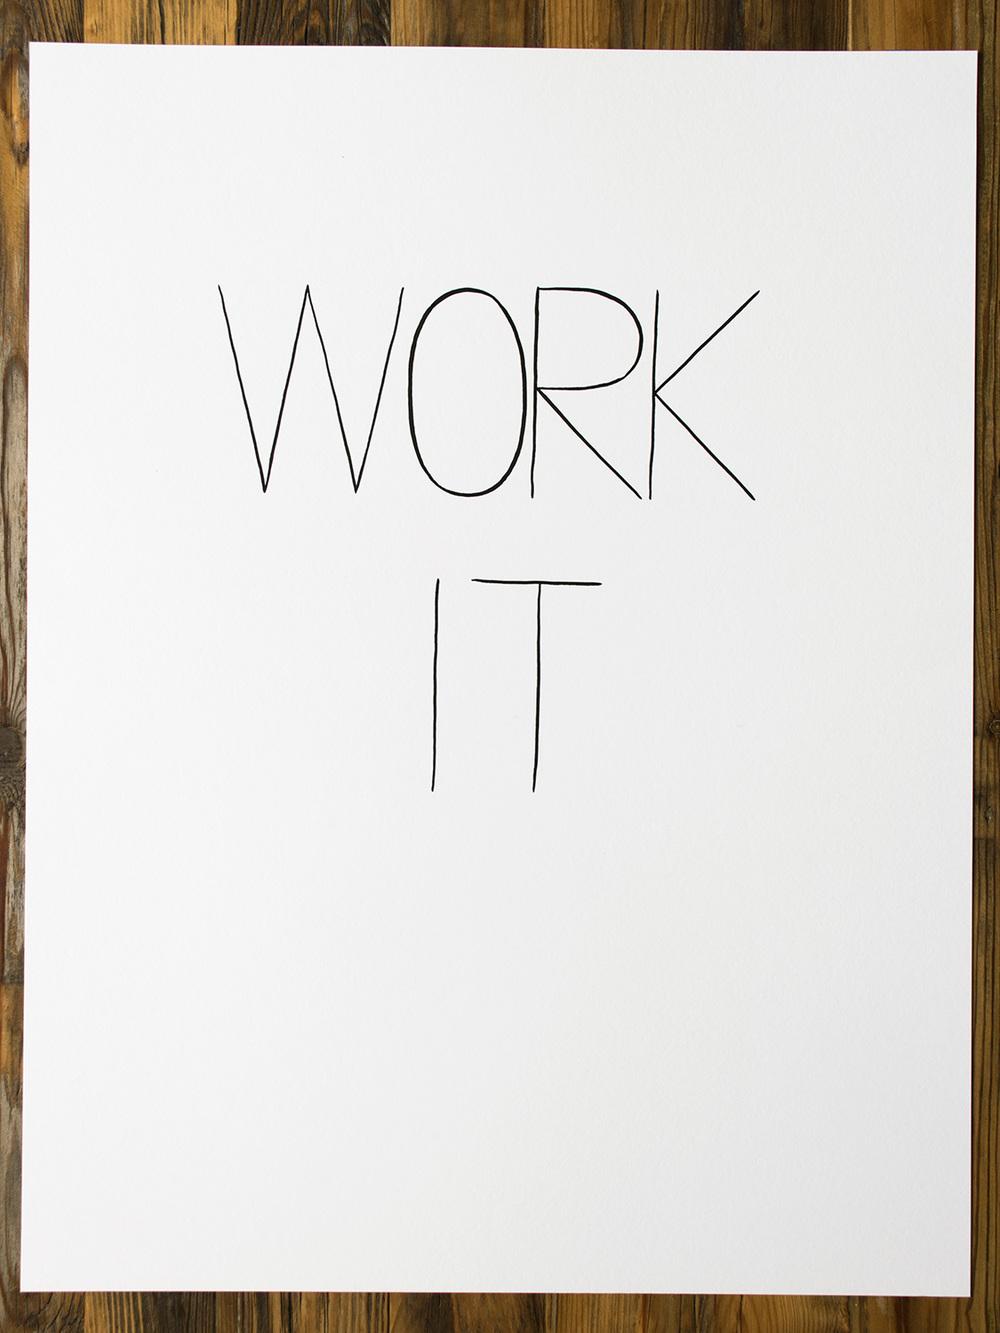 work_it-1500x1125.jpg